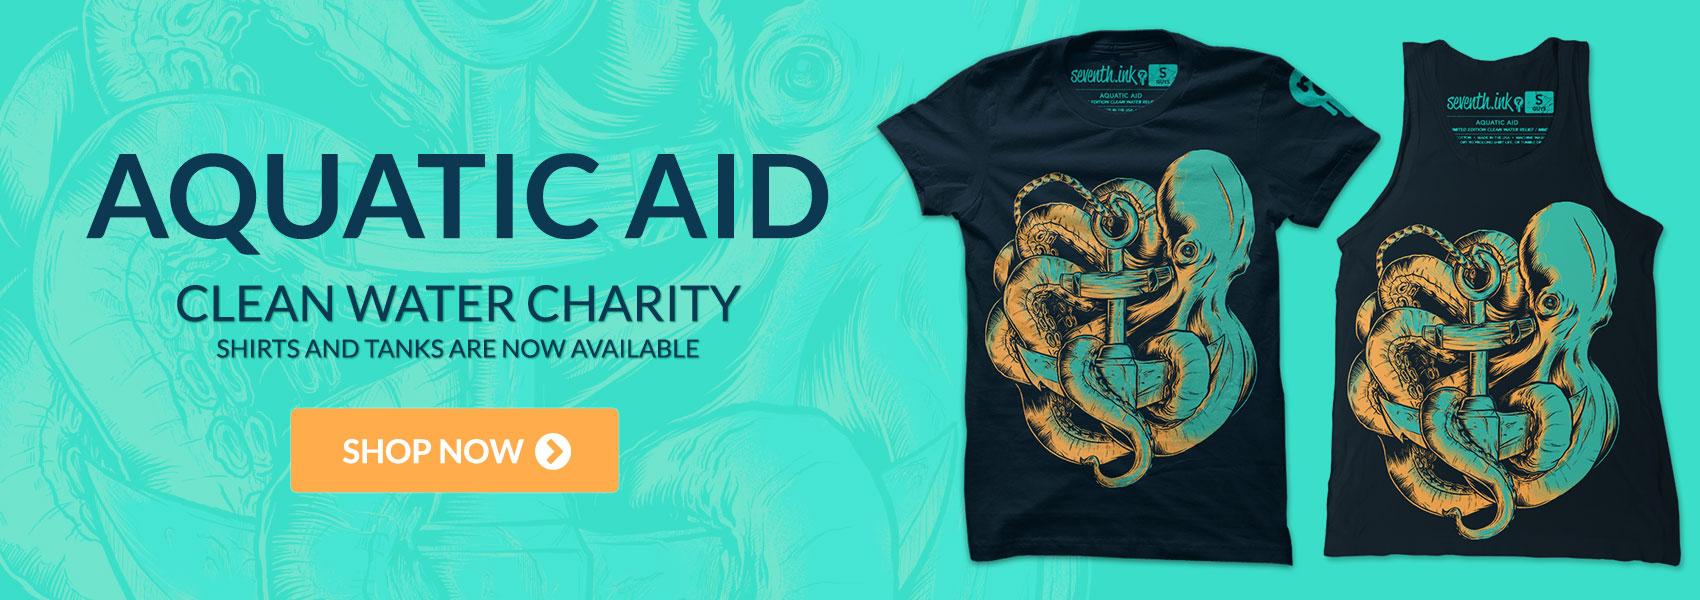 hero-2015-aquatic-aid